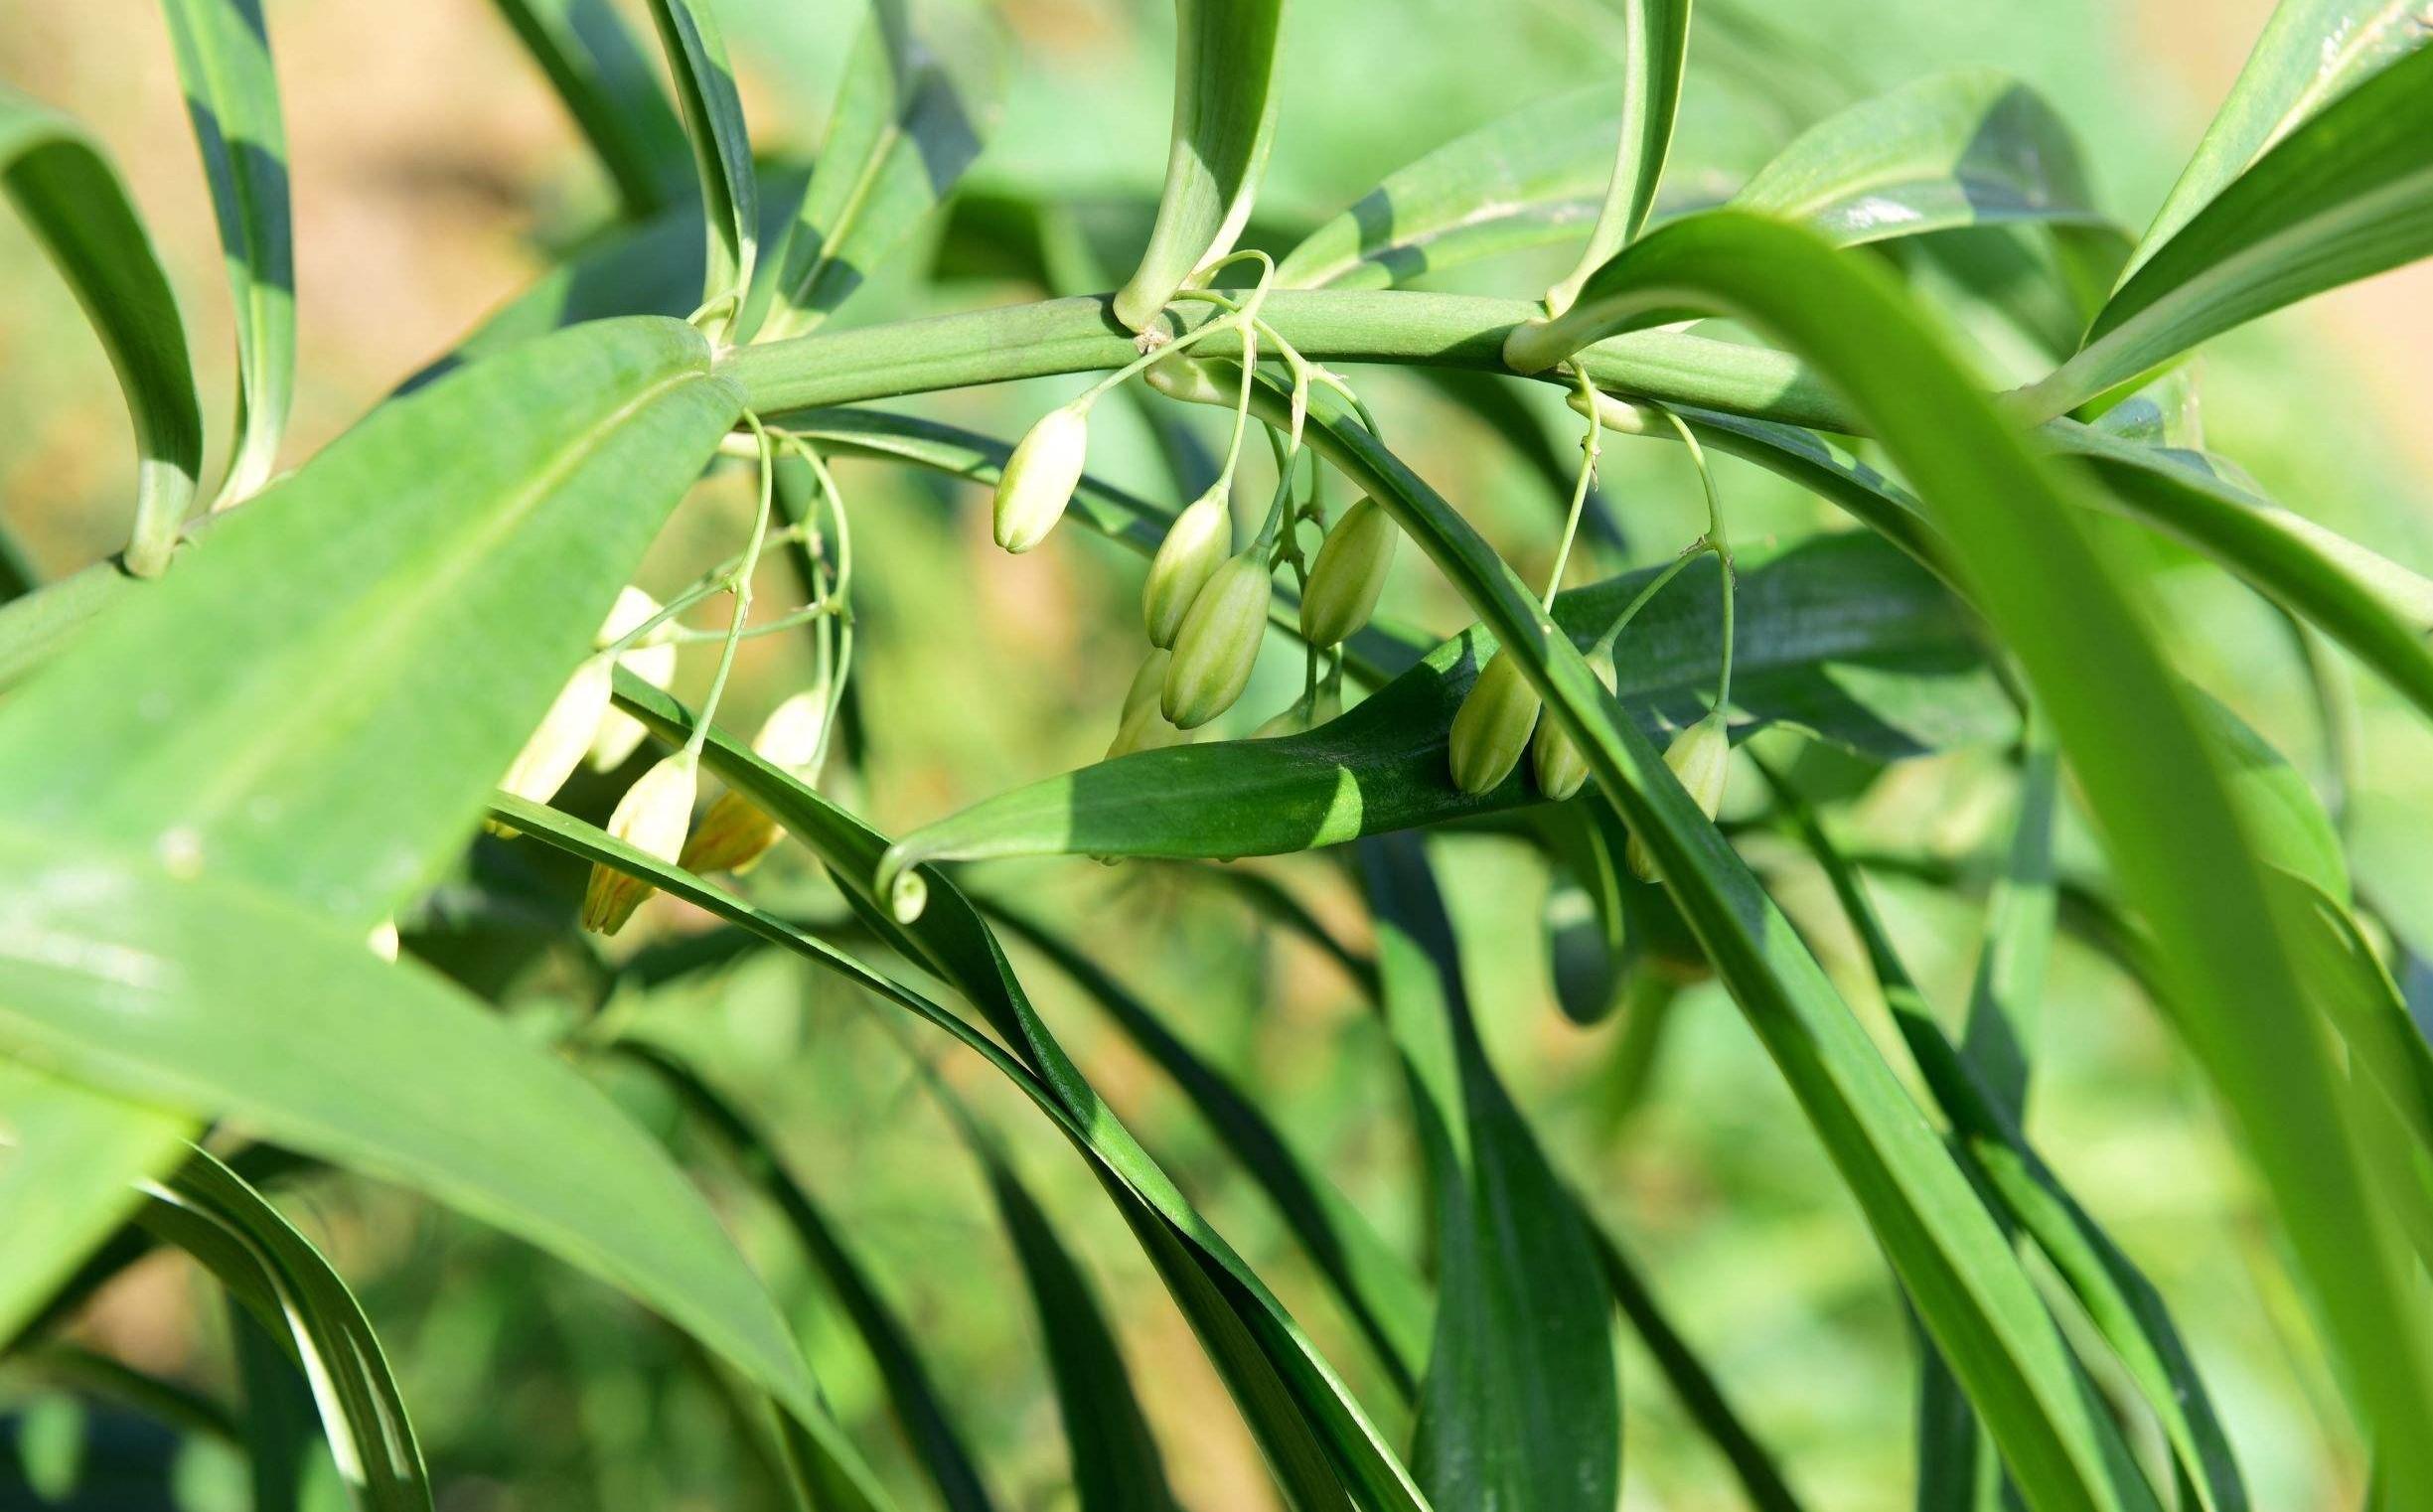 Polygonatum sibiricum seed